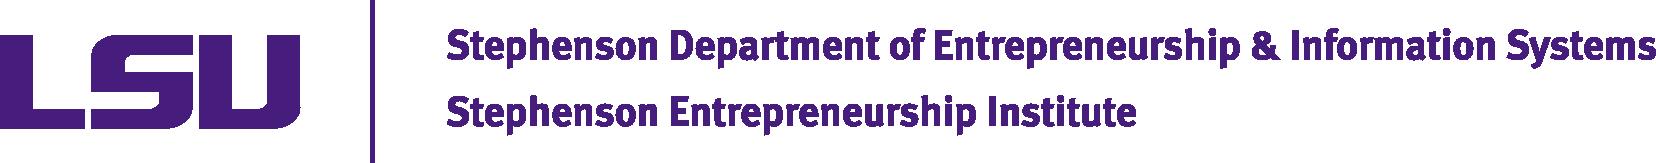 lsu-logo-2-units-sdeis-sei-purple.png